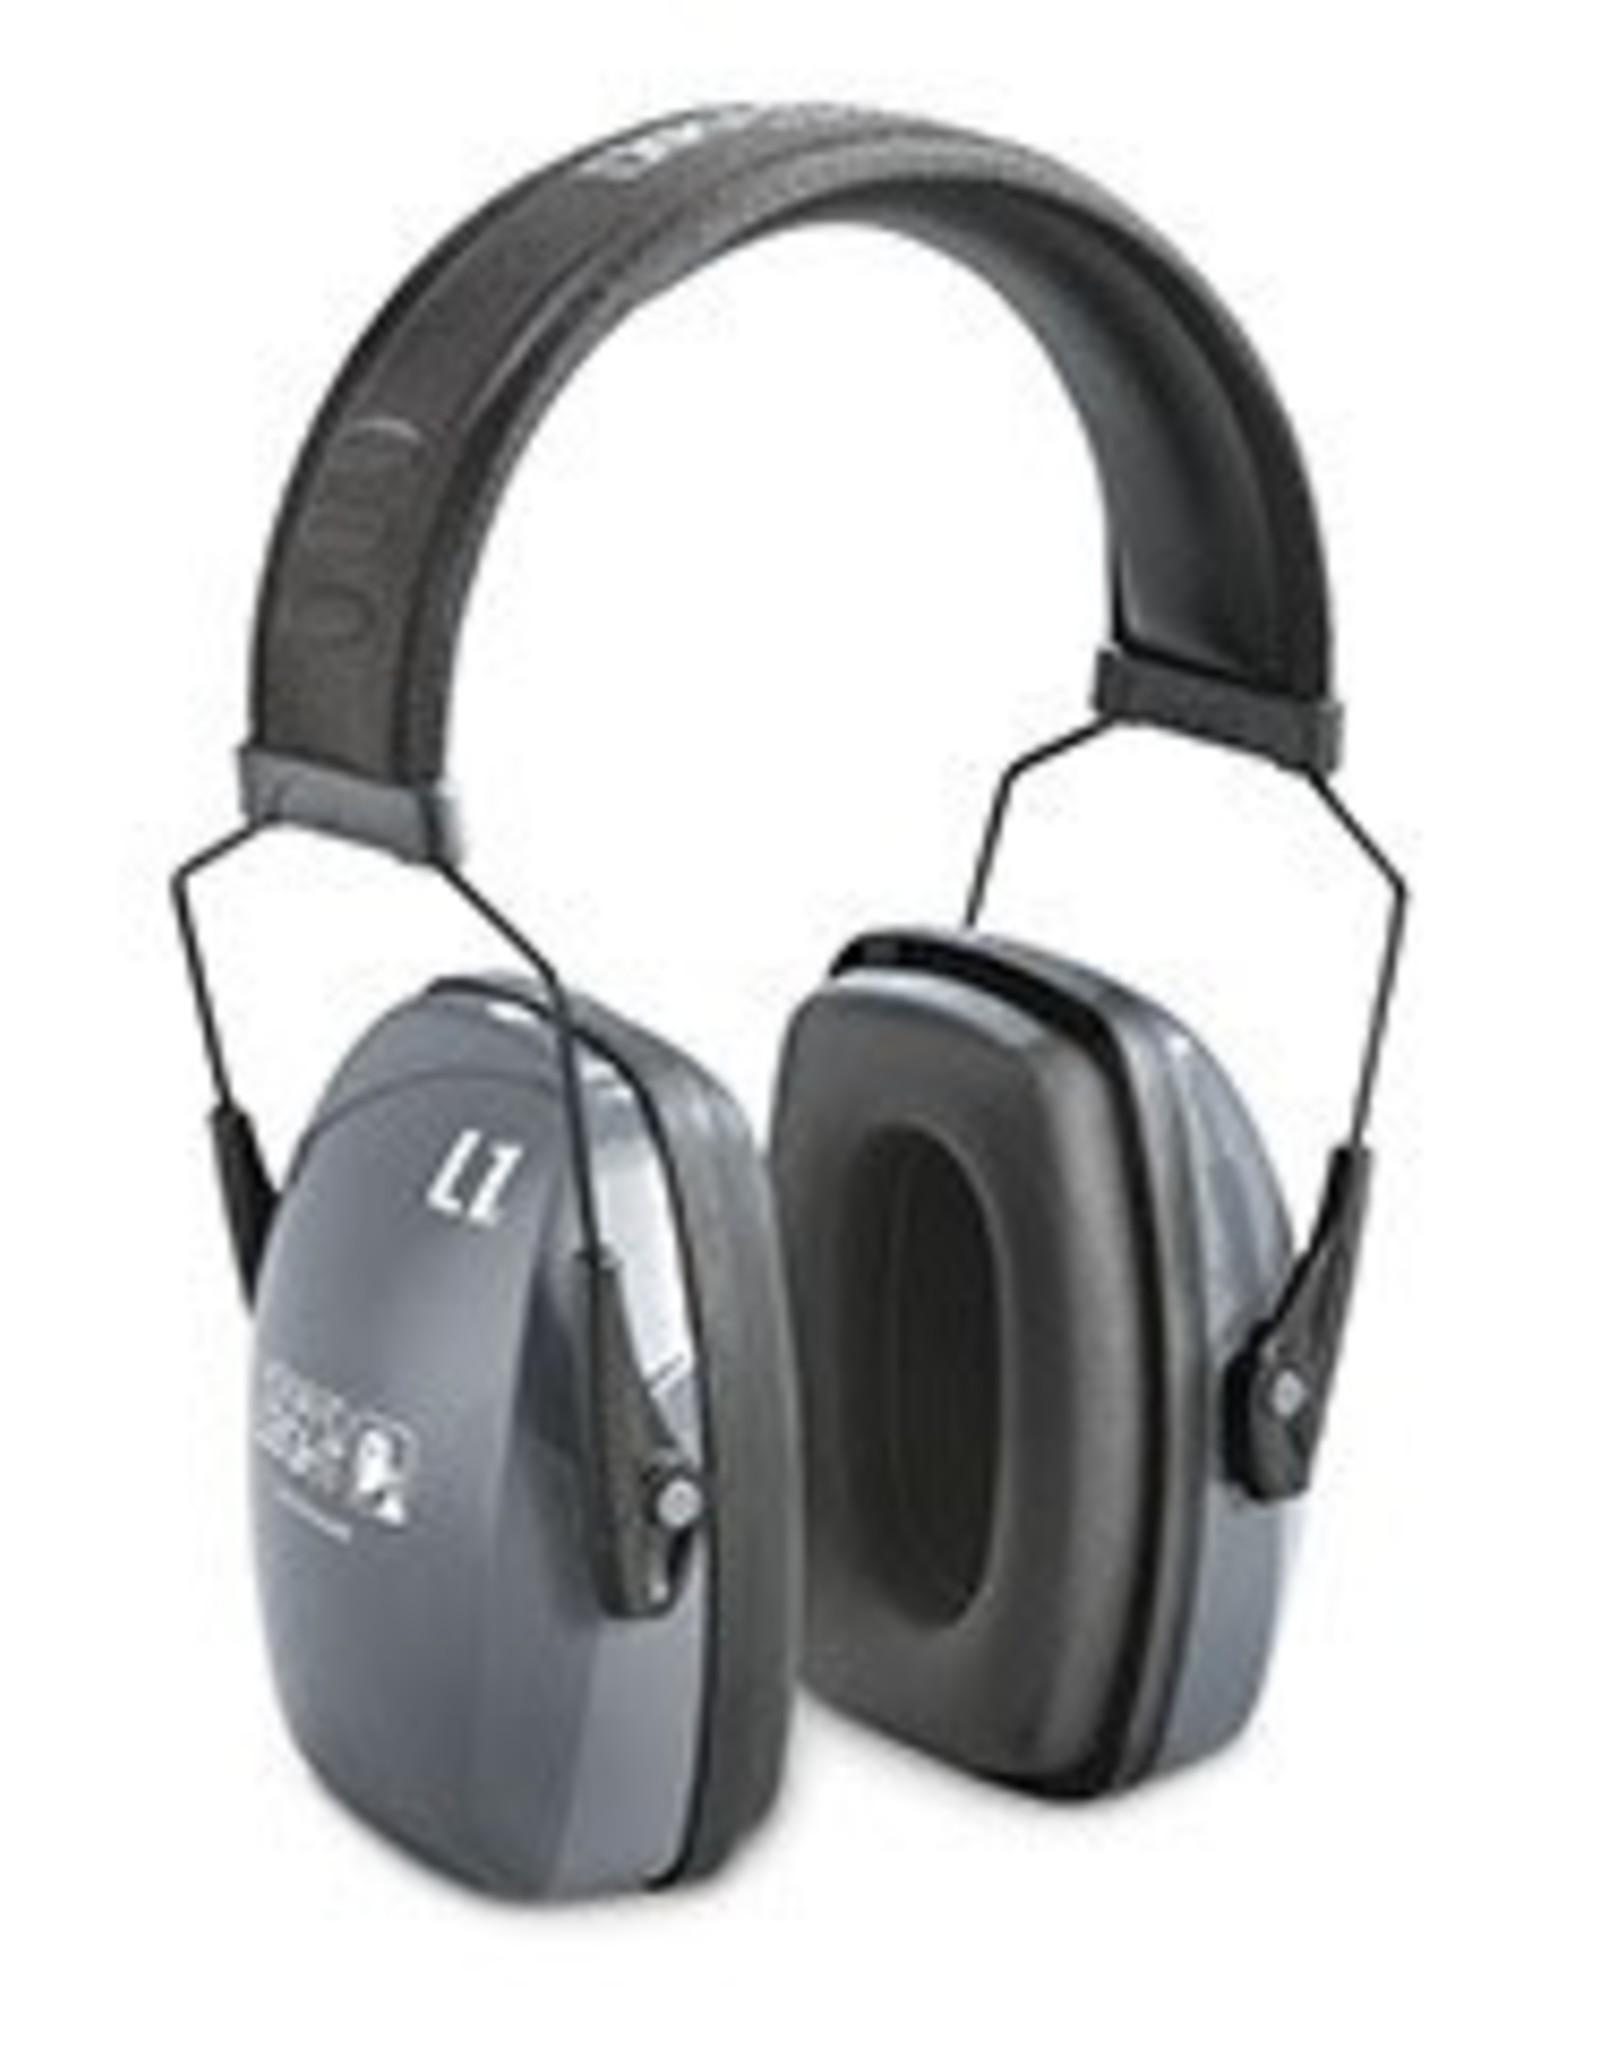 Howard Leight Howard Leight Leightning L1 Headband Earmuff 29dB Class 5